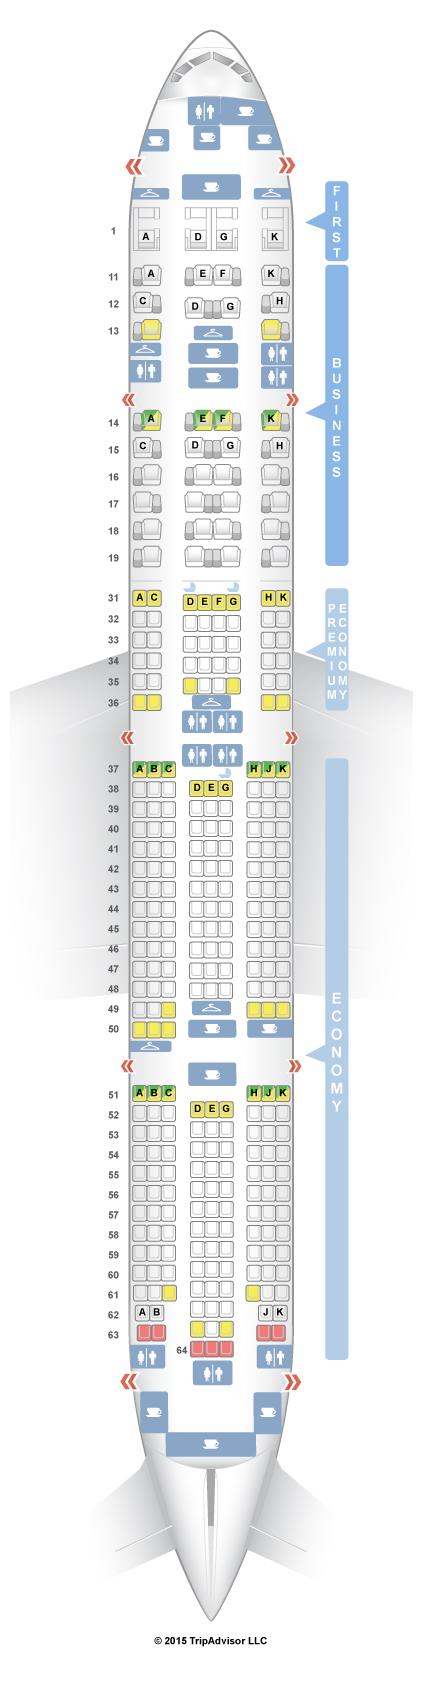 Boeing 777 300er Seat Guru Air France Wallseat Co